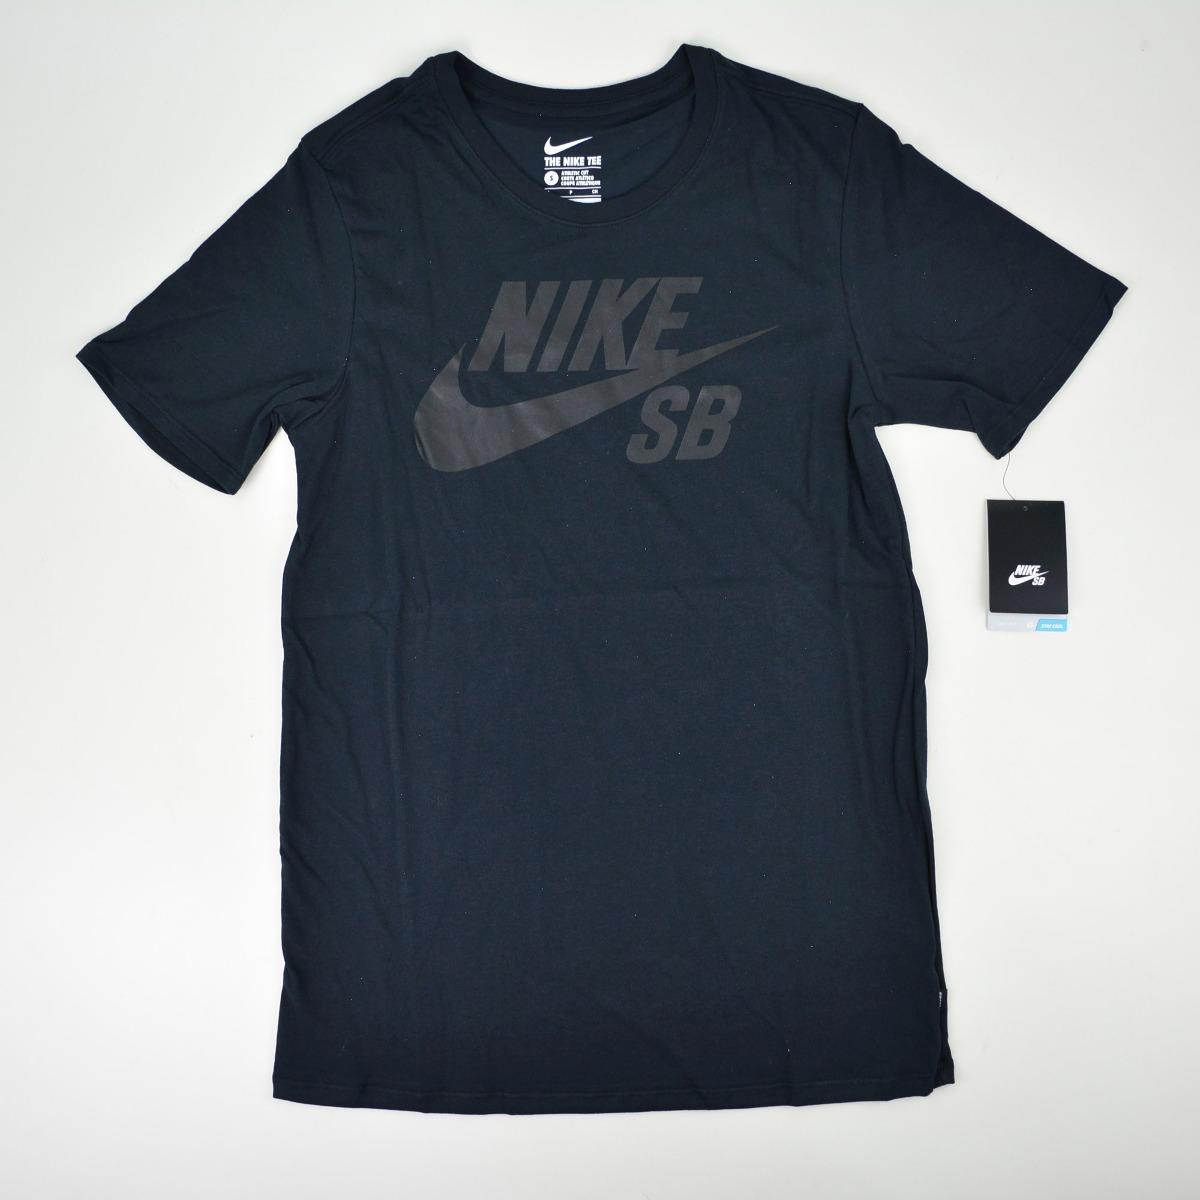 fa007396a54b camiseta nike sb logo preto. Carregando zoom.